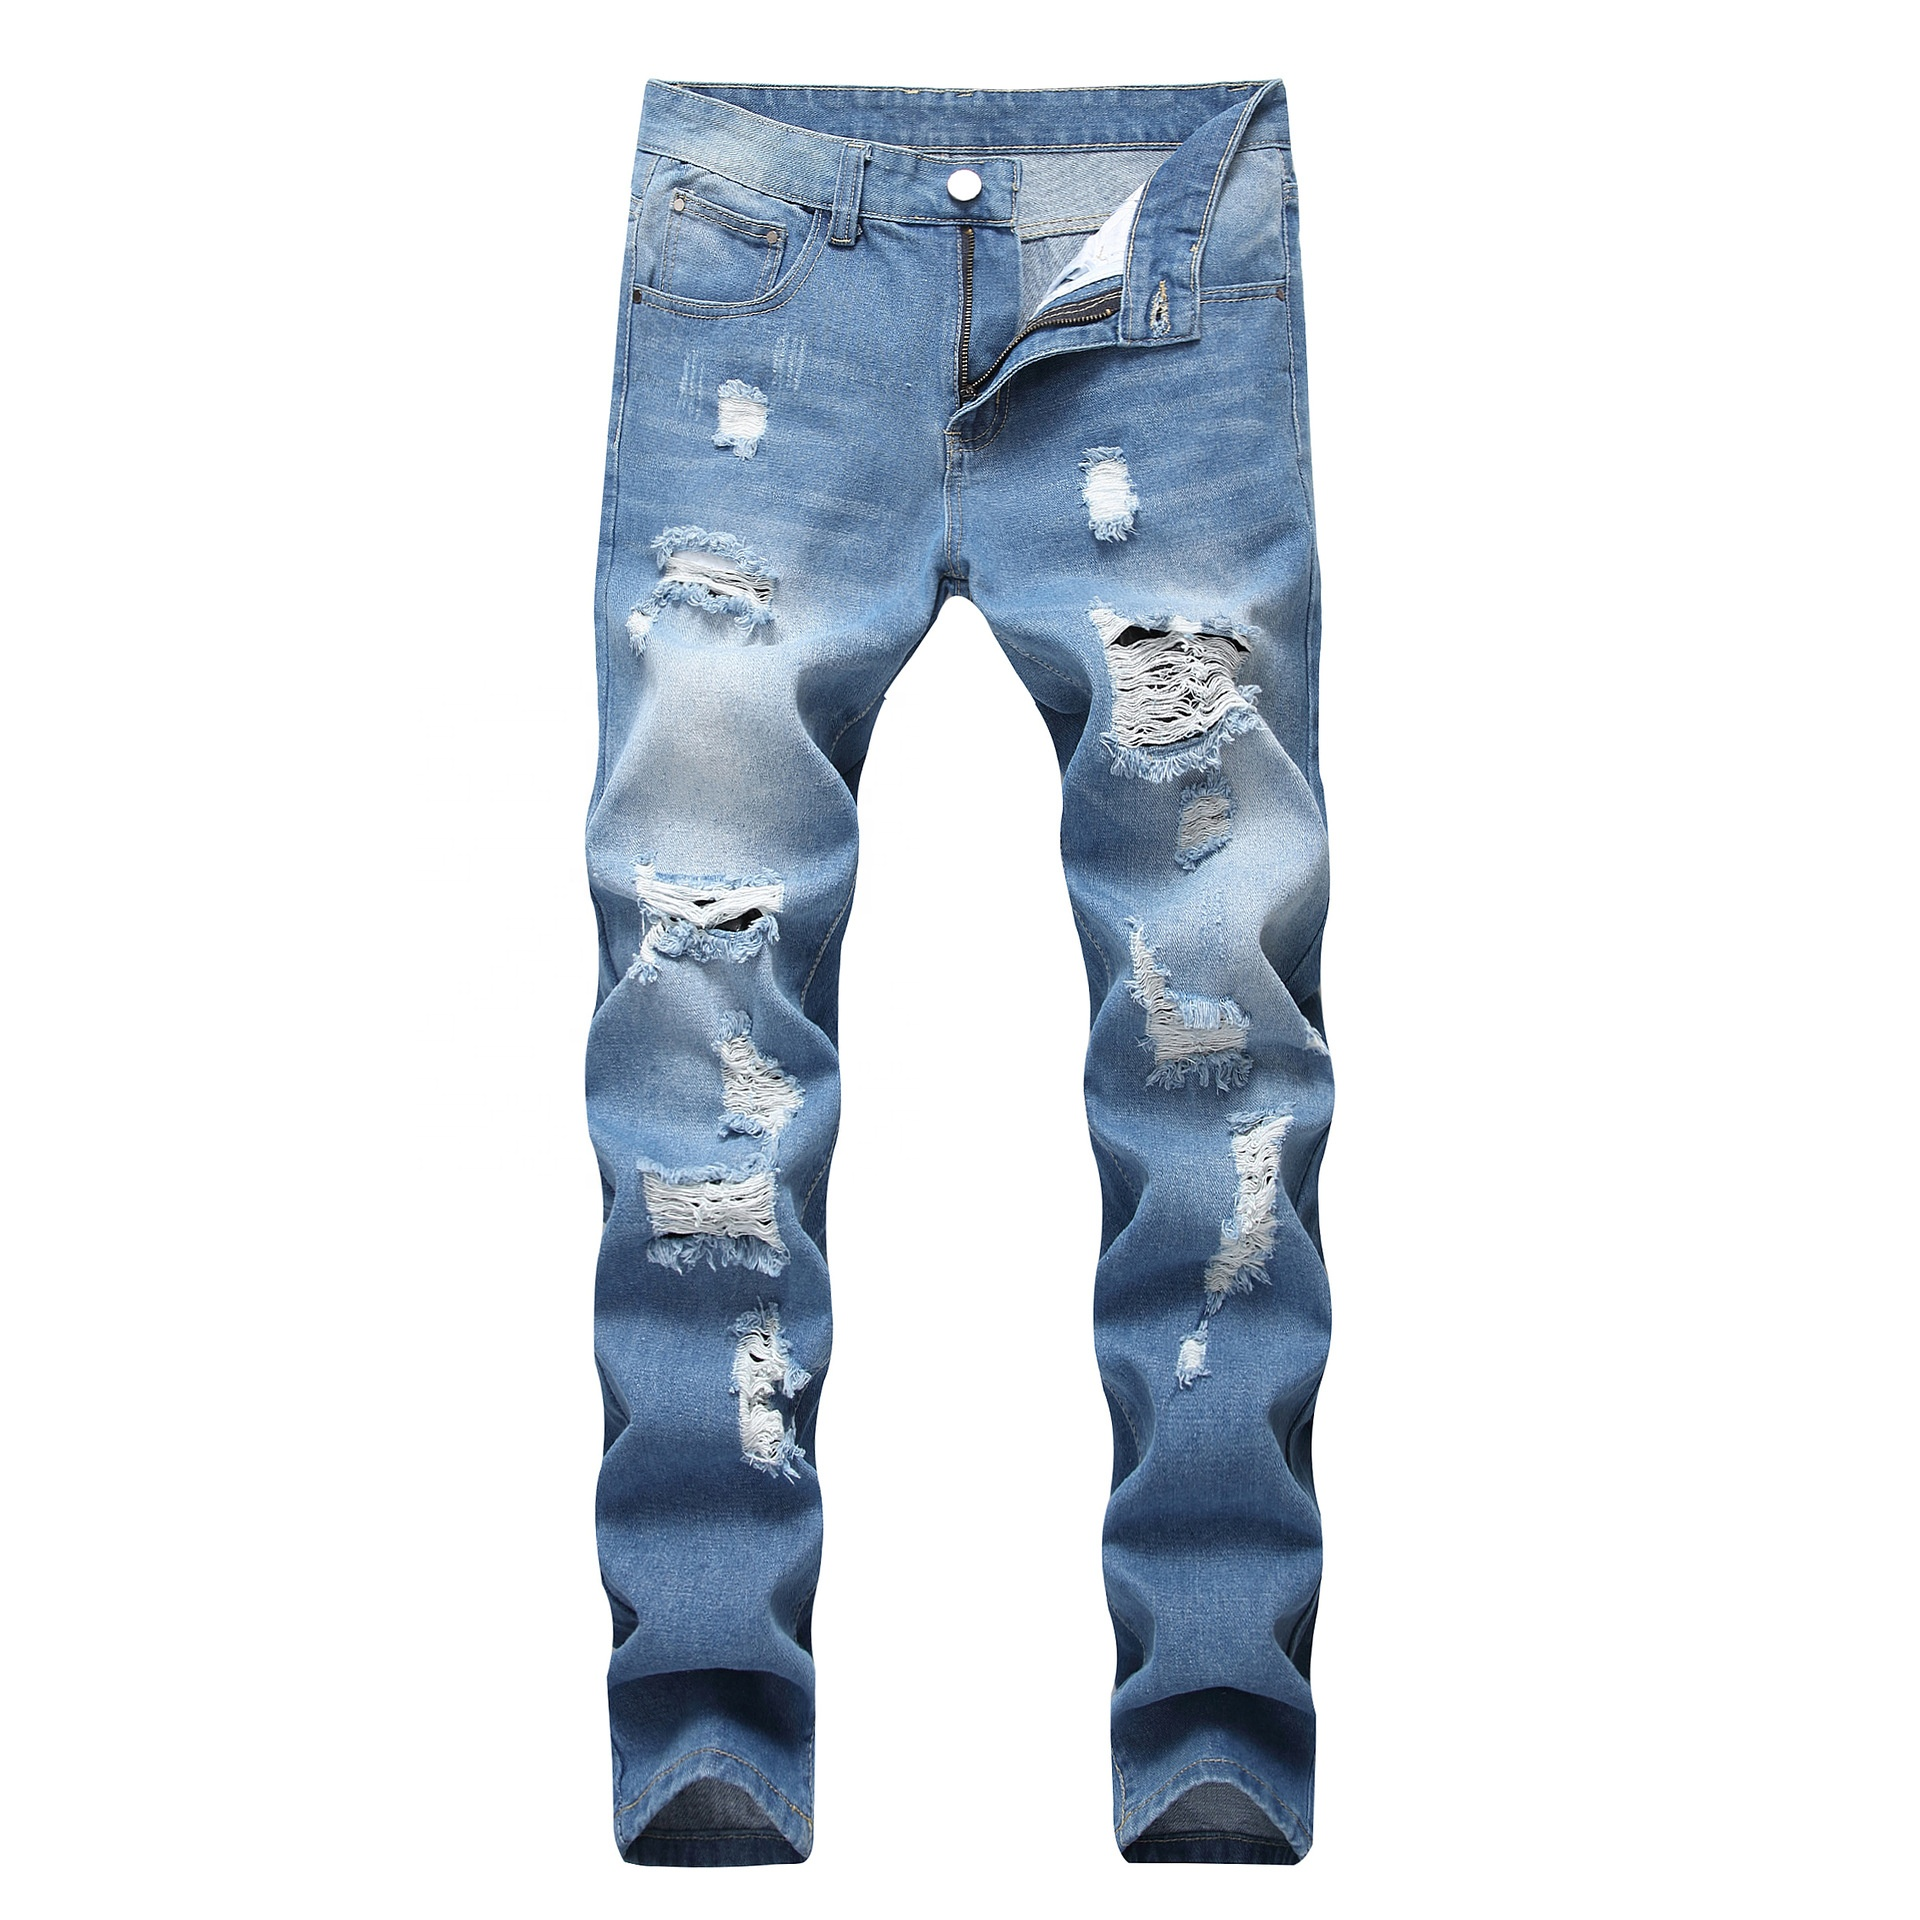 Ballena Azul Invalido Excelente Pantalones Rotos De Moda Para Hombre Ocmeditation Org